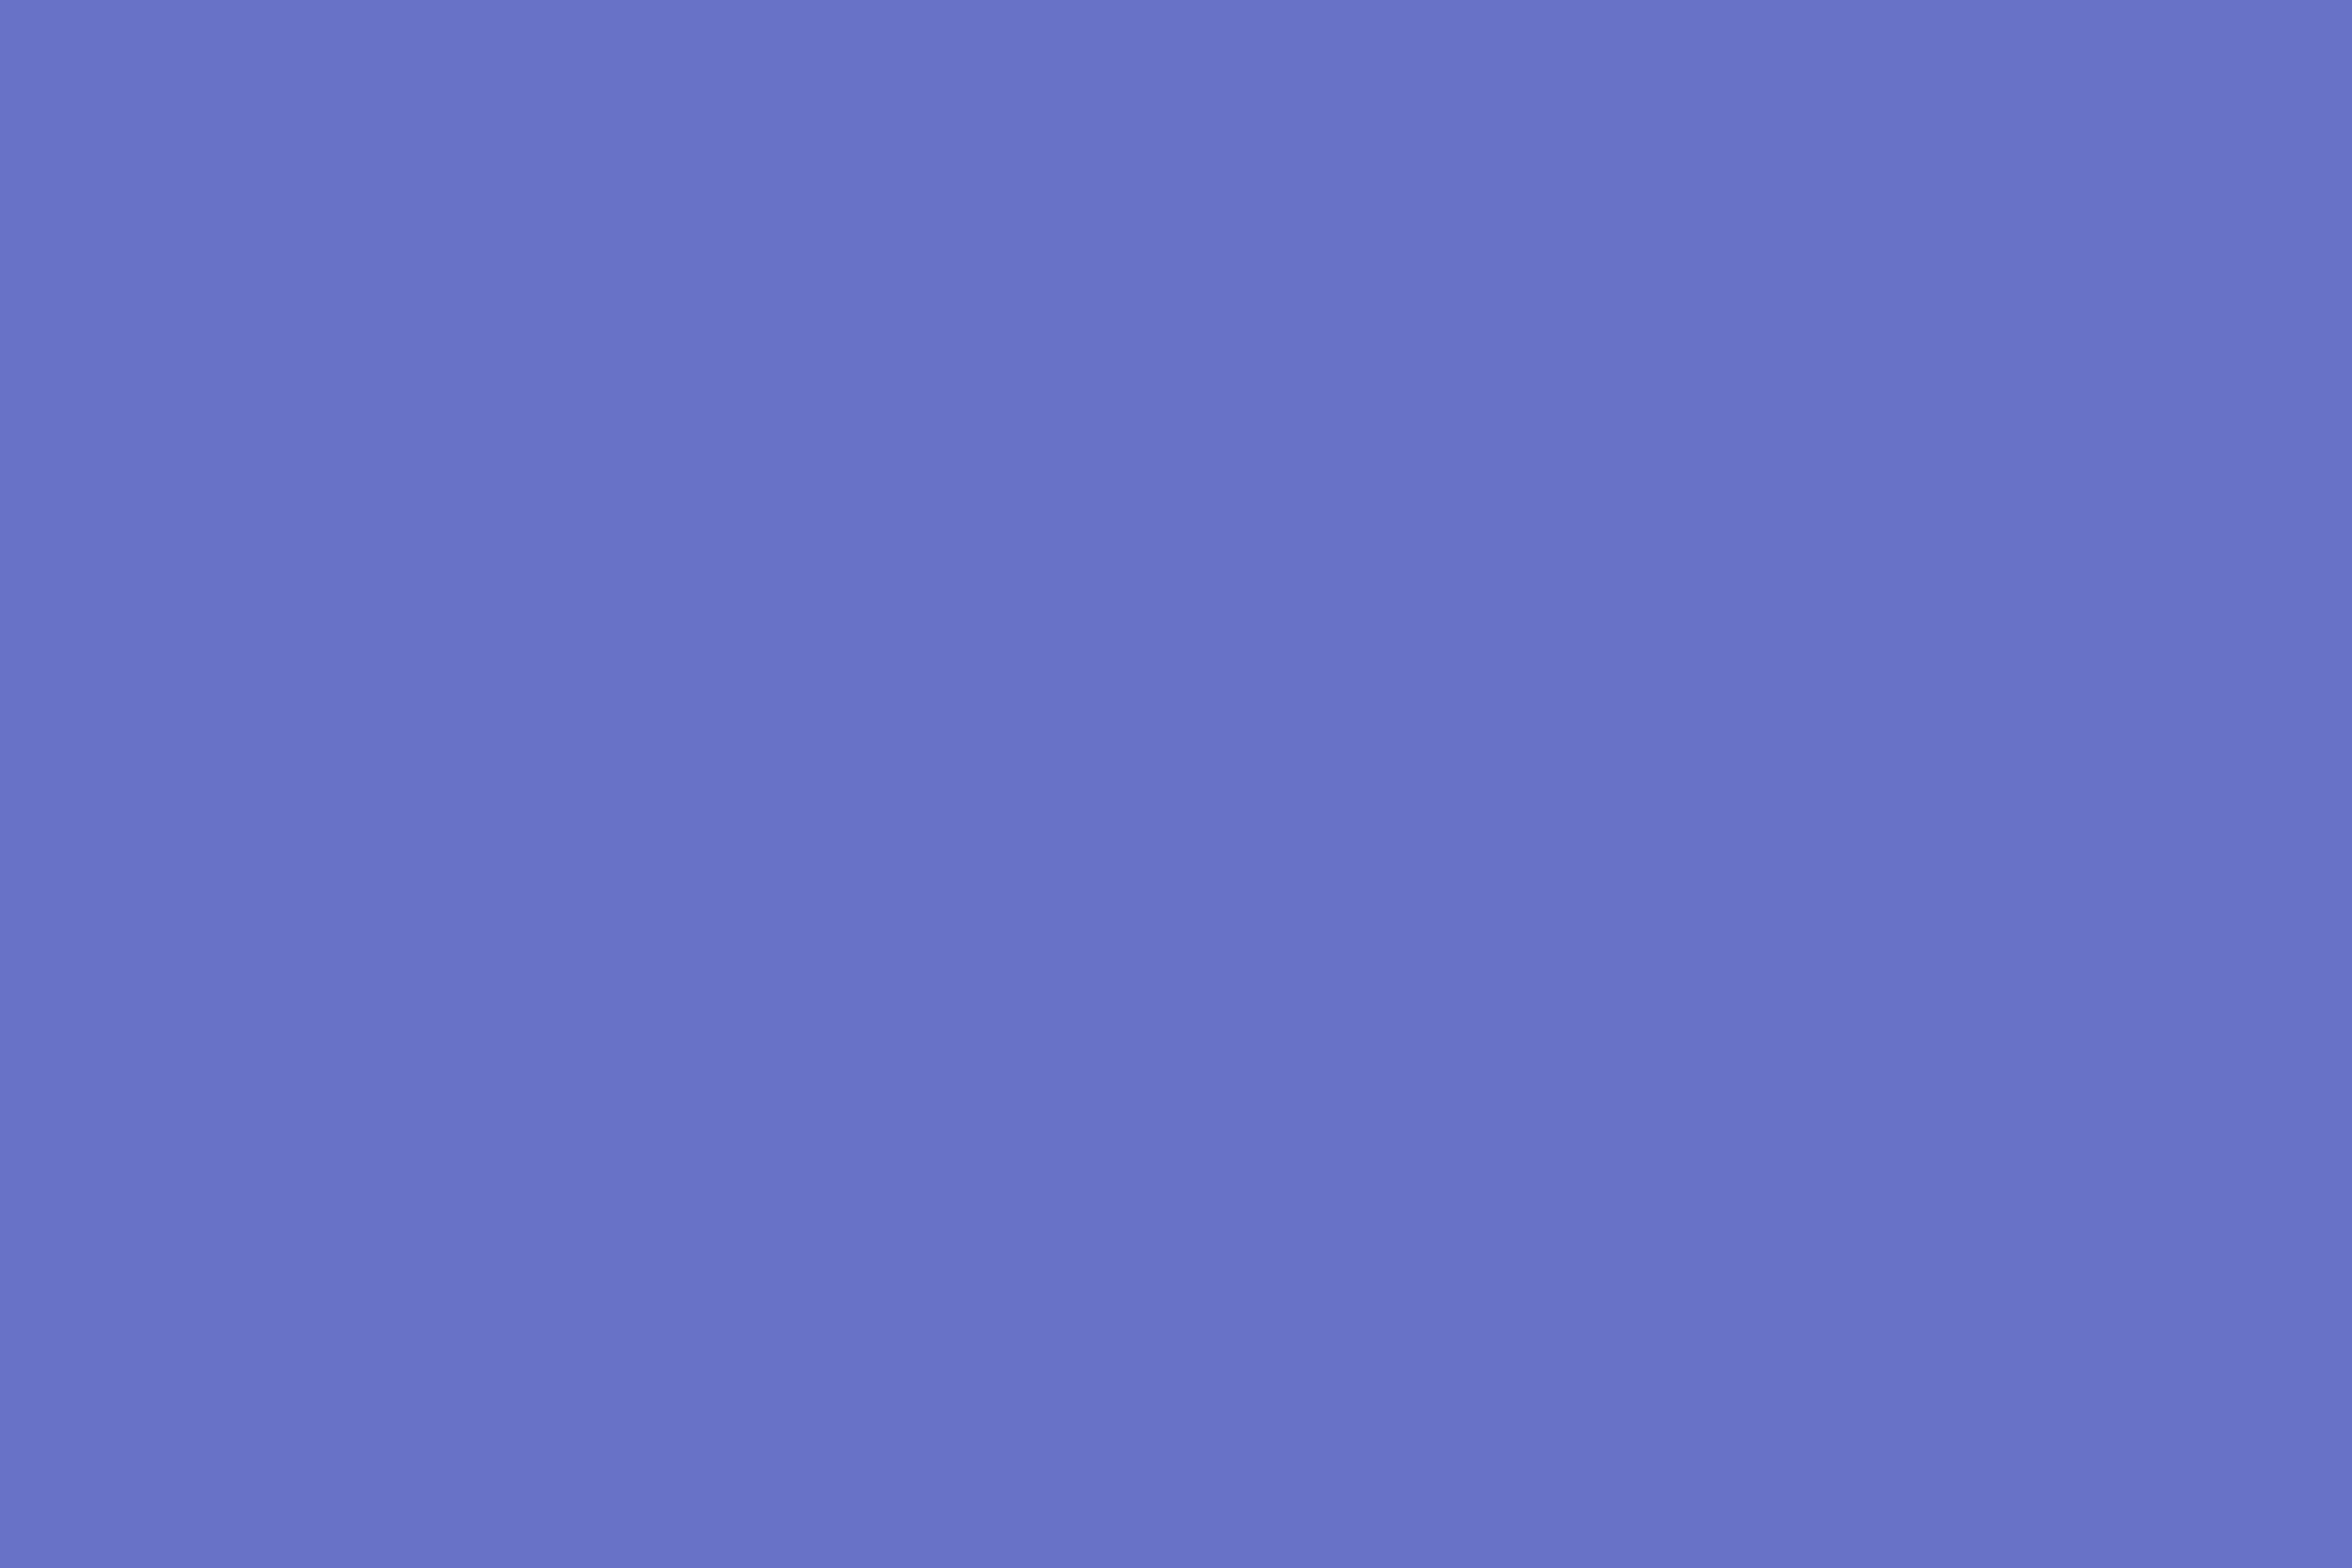 "Name Here - The following is placeholder text known as ""lorem ipsum,"" which is scrambled Latin used by designers to mimic real copy. Donec eu est non lacus lacinia semper. Vivamus a ante congue, porta nunc nec, hendrerit turpis. Lorem ipsum dolor sit amet, consectetur adipiscing elit. Mauris id fermentum nulla.Phasellus sodales massa malesuada tellus fringilla, nec bibendum tellus blandit. Donec ac fringilla turpis. Quisque congue porttitor ullamcorper. Quisque congue porttitor ullamcorper."